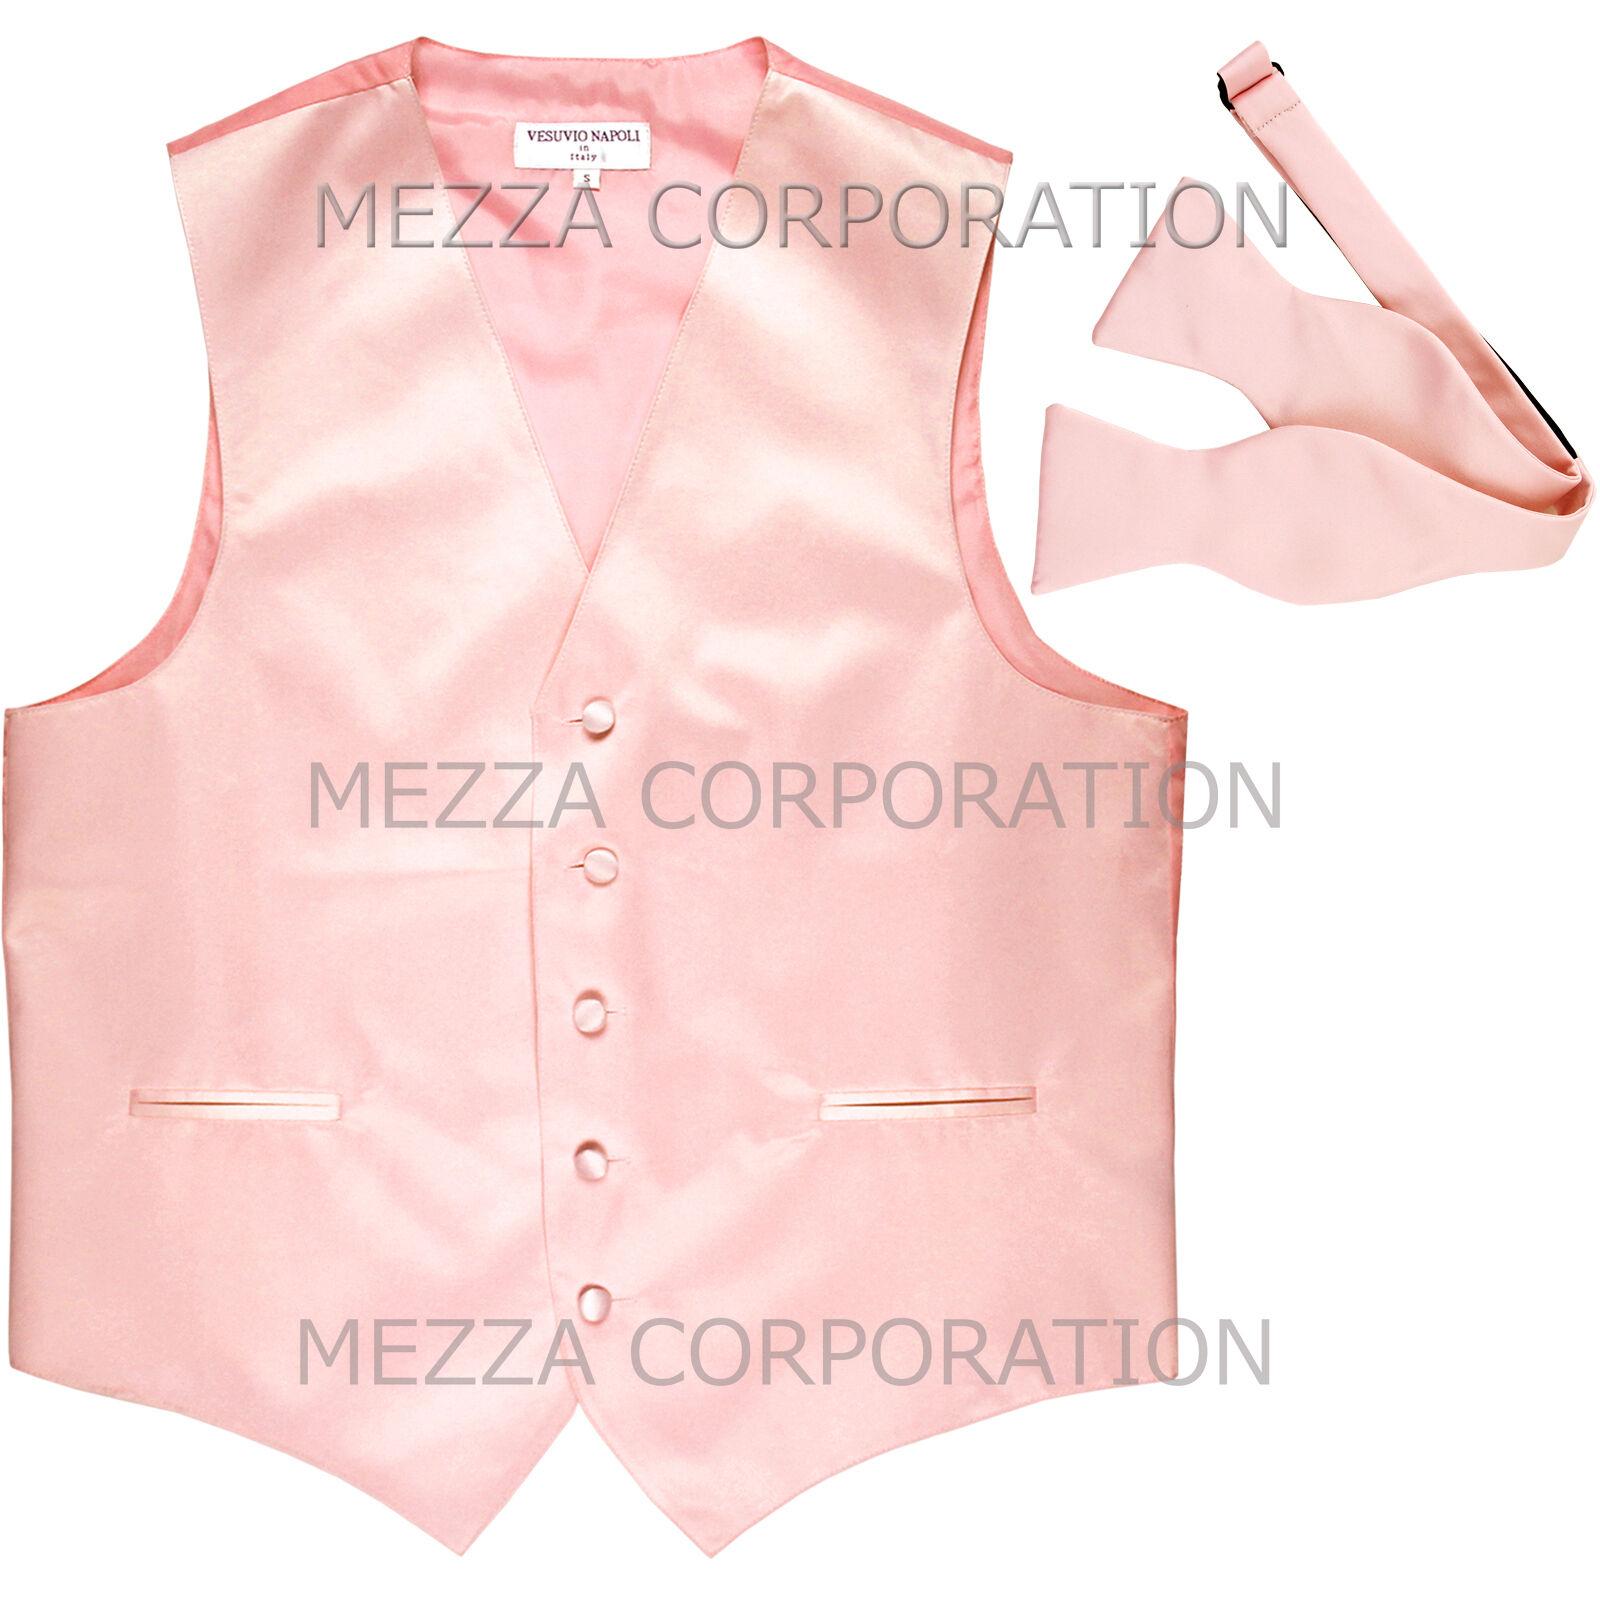 New Men's Formal Vest Tuxedo Waistcoat with free style self-tie Bowtie navy blue